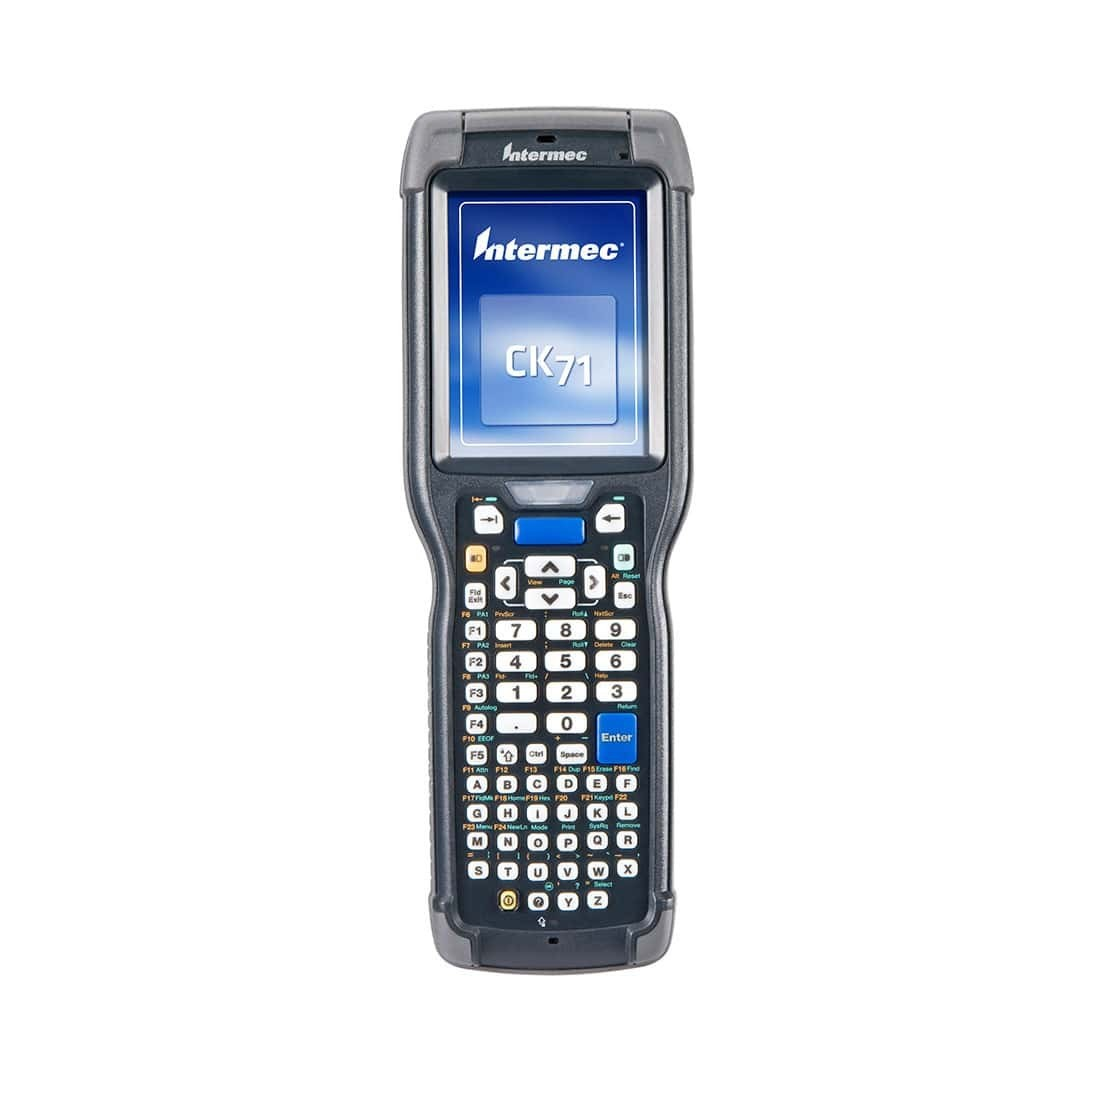 Intermec CK71 2D Scanner Alphanumeric KeyPad BlueTooth Wind Embed Mobile Computer CK71AA4KC00W1100